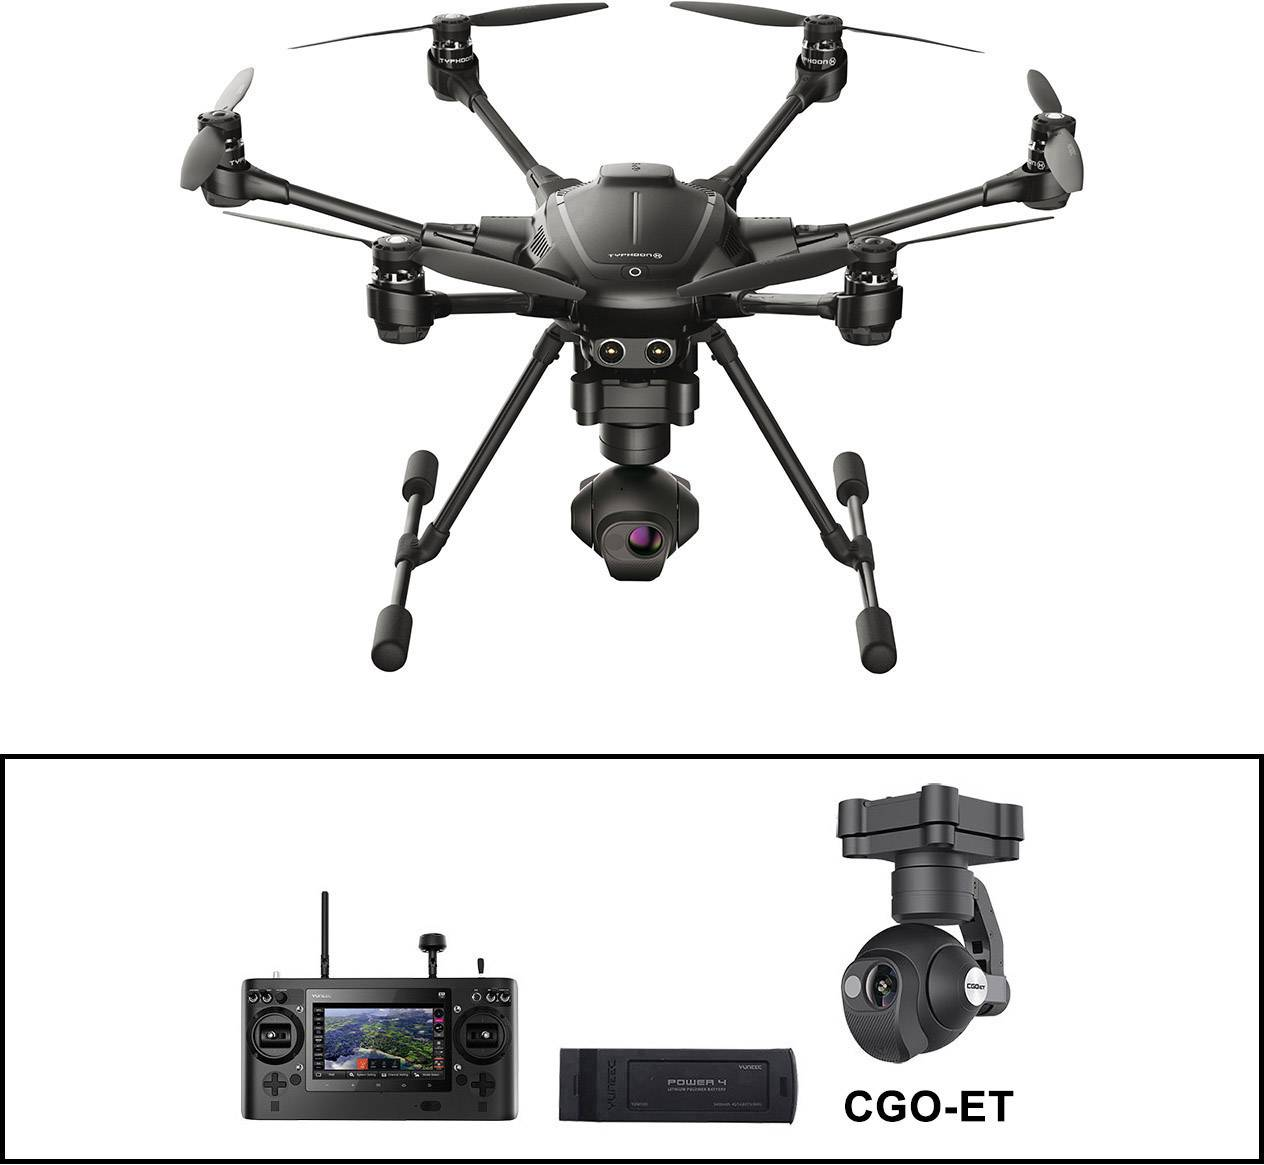 Drohne Mit Wärmebild